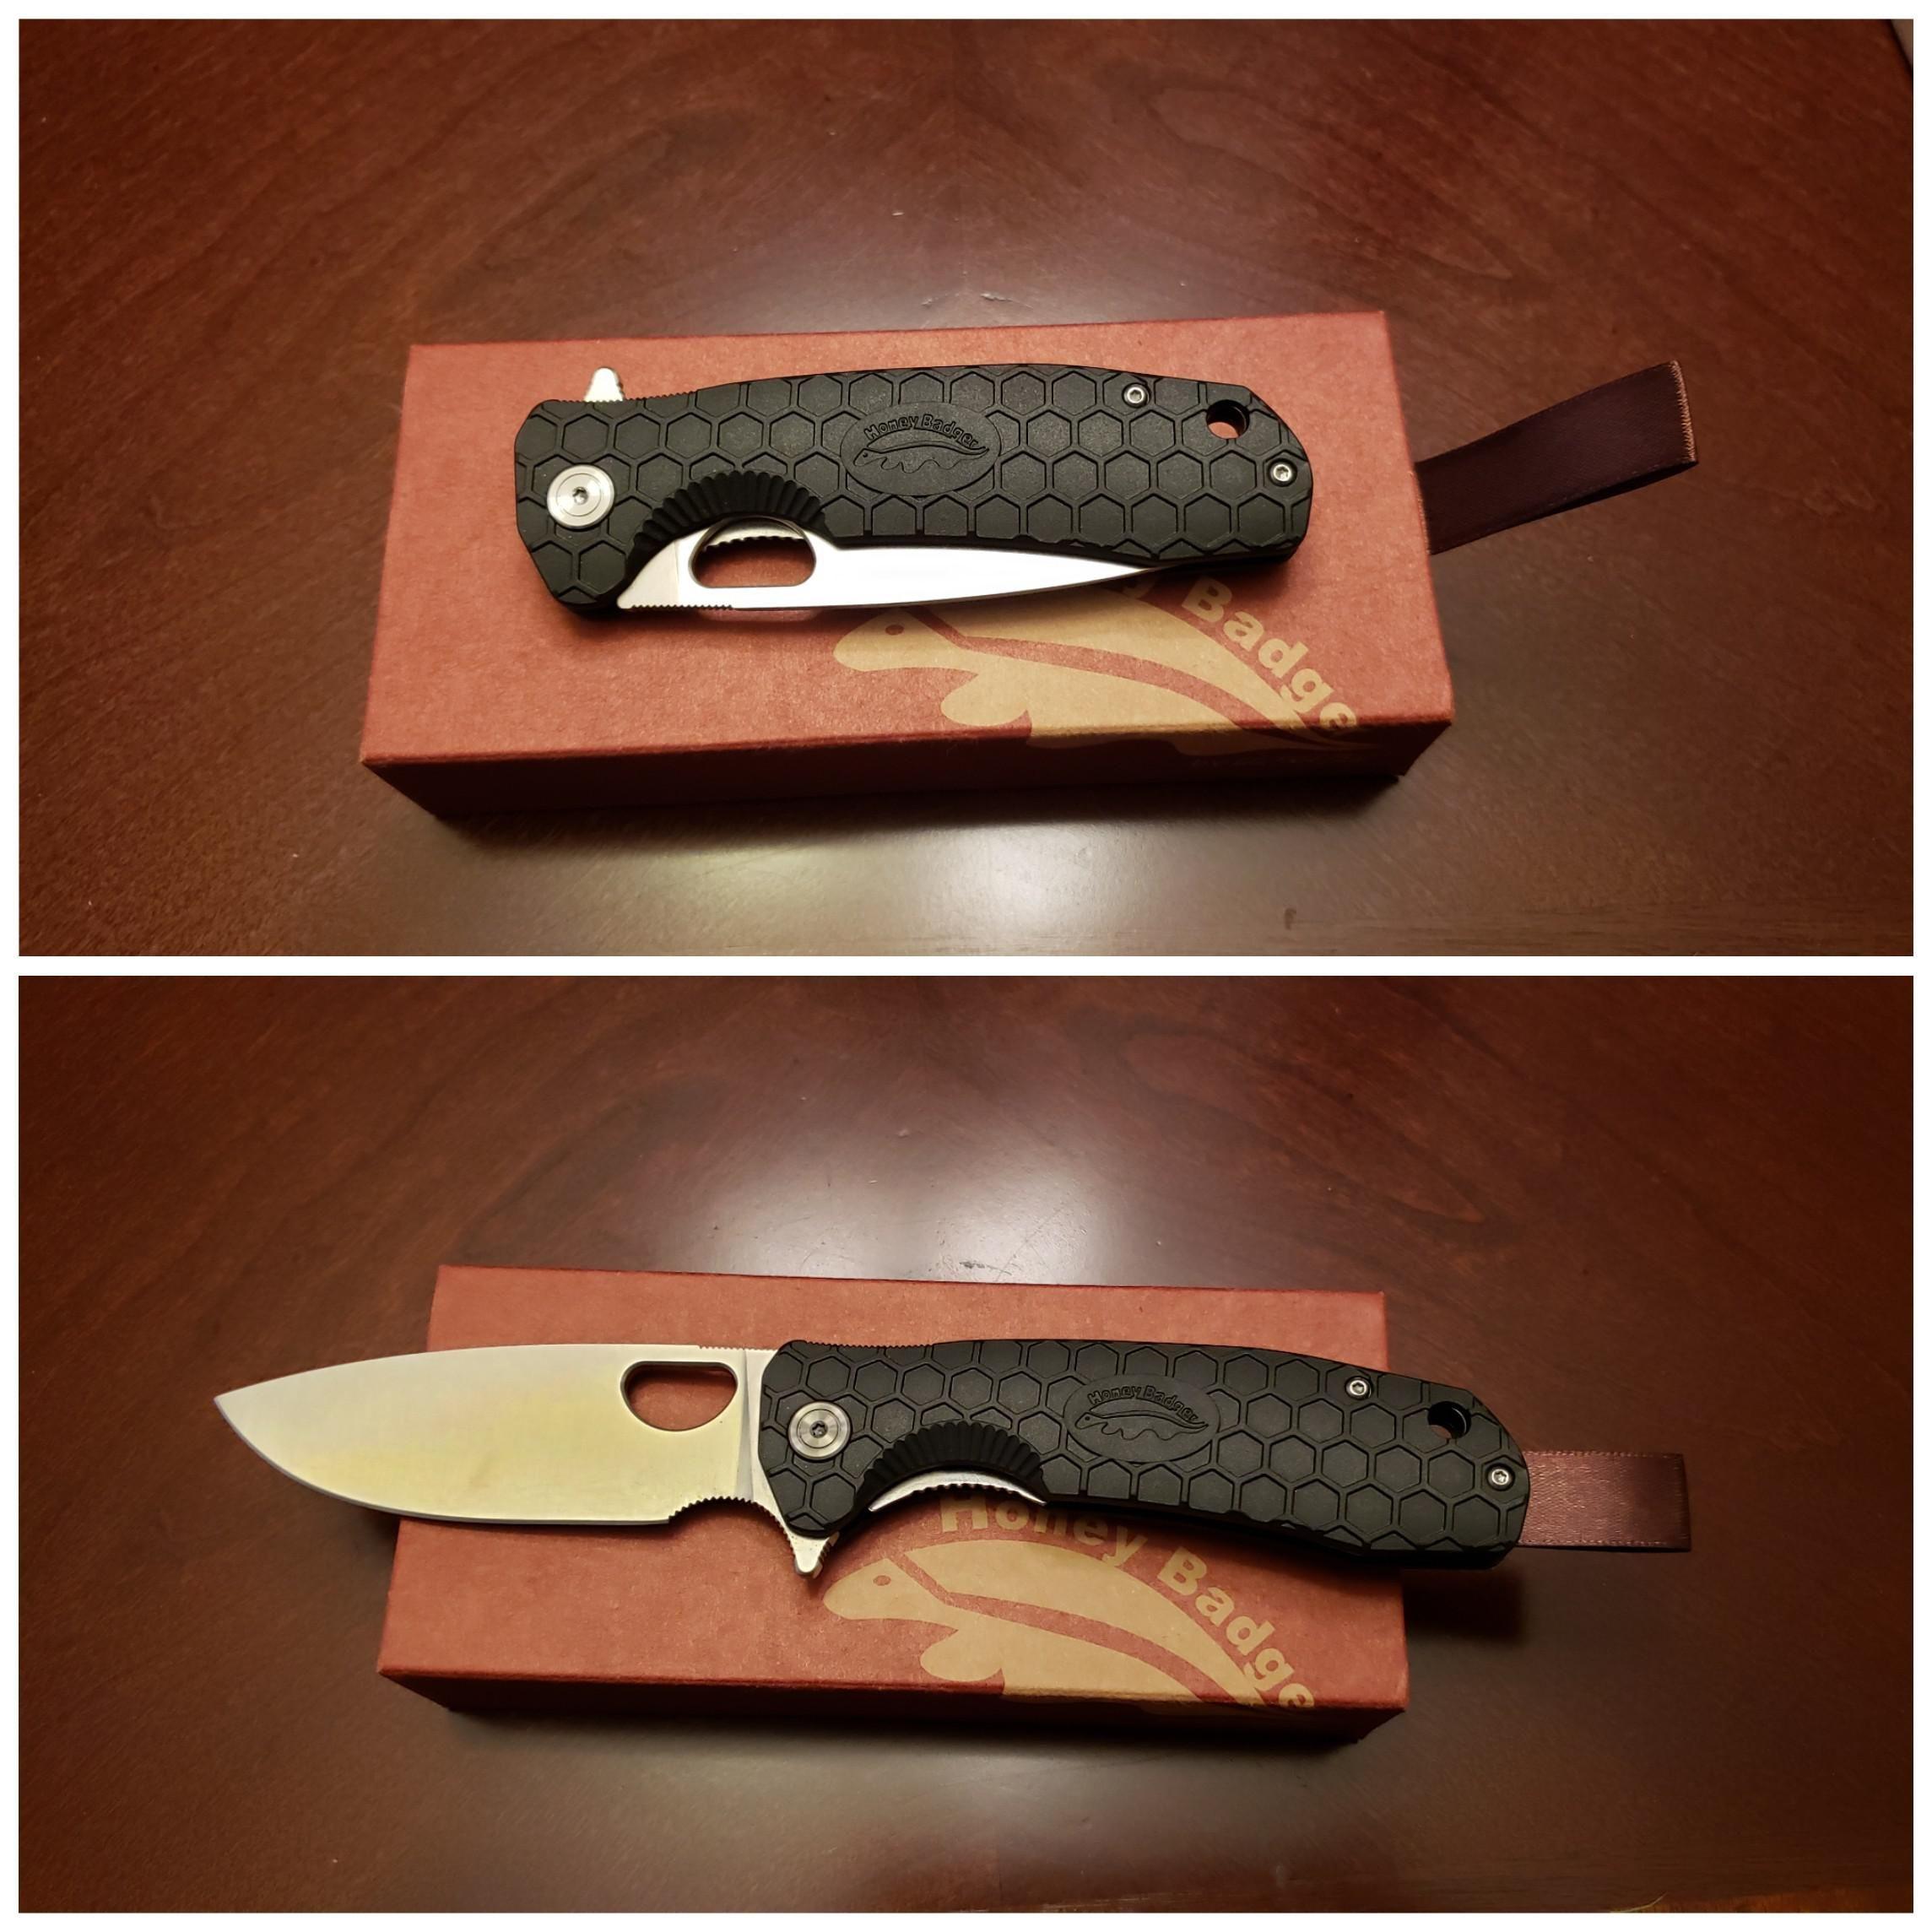 Okc Rat 3 Black Kydex Belt Sheath: #BestHuntingKnife #huntingknife #knifemetrics